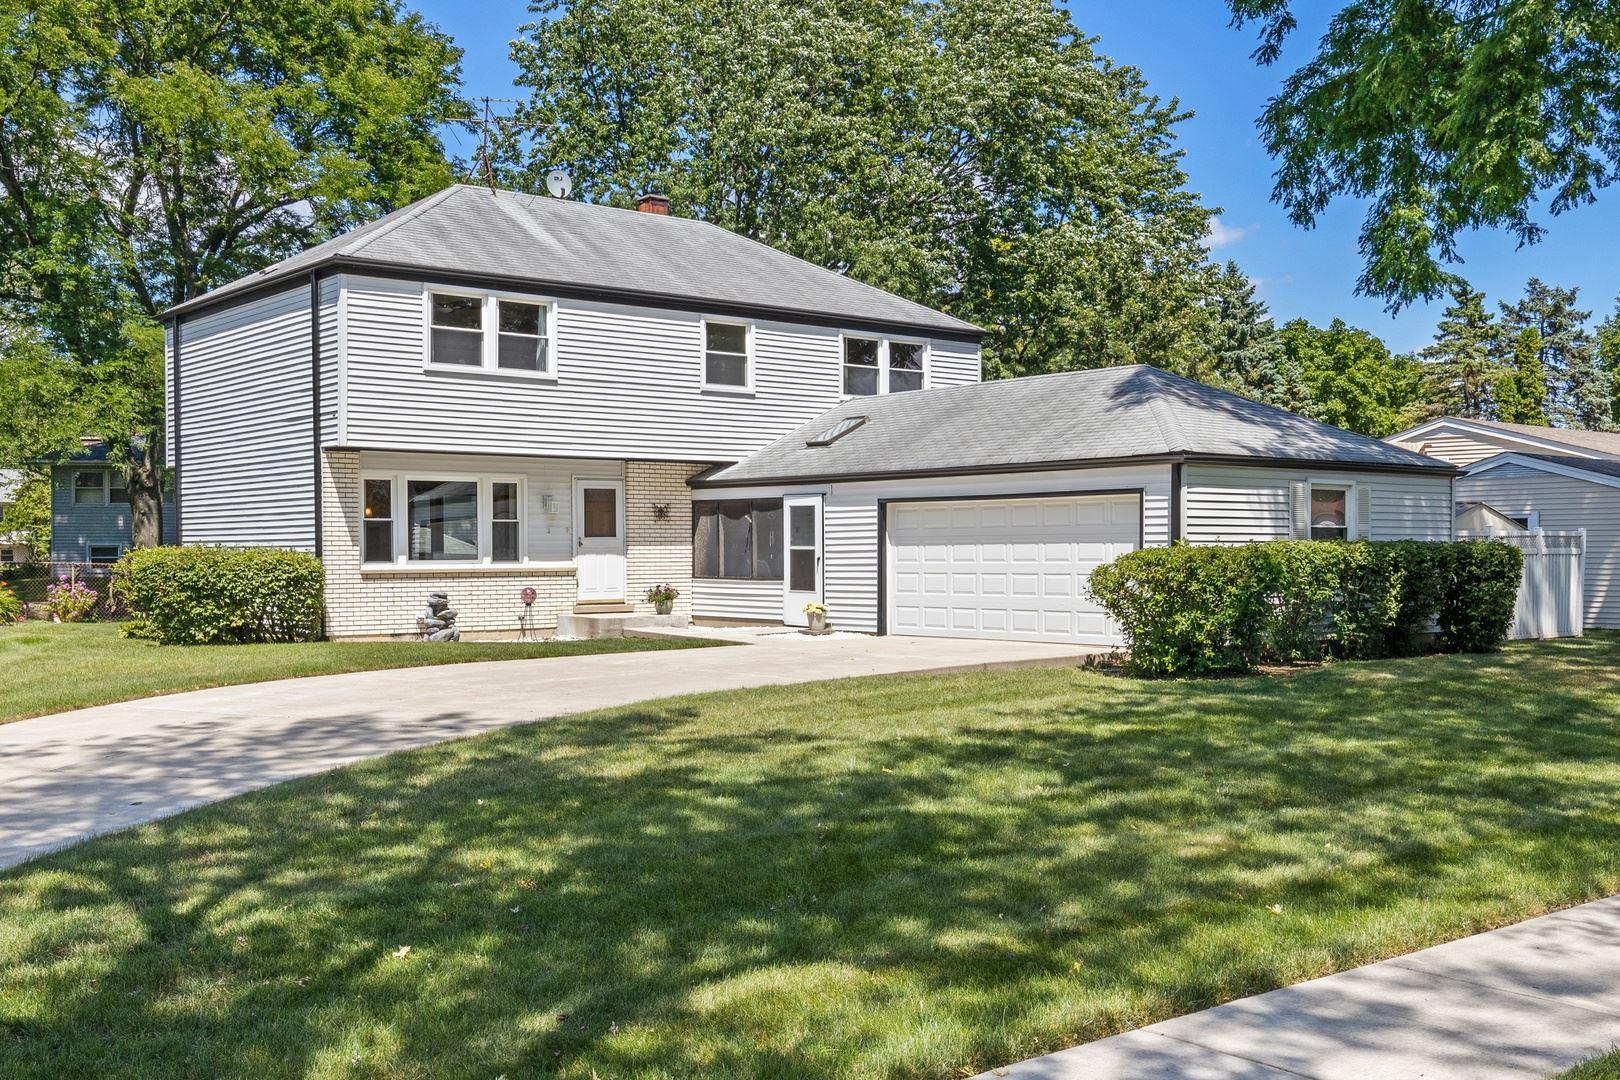 3 W Beechwood Court, Buffalo Grove, IL 60089 - #: 10800836